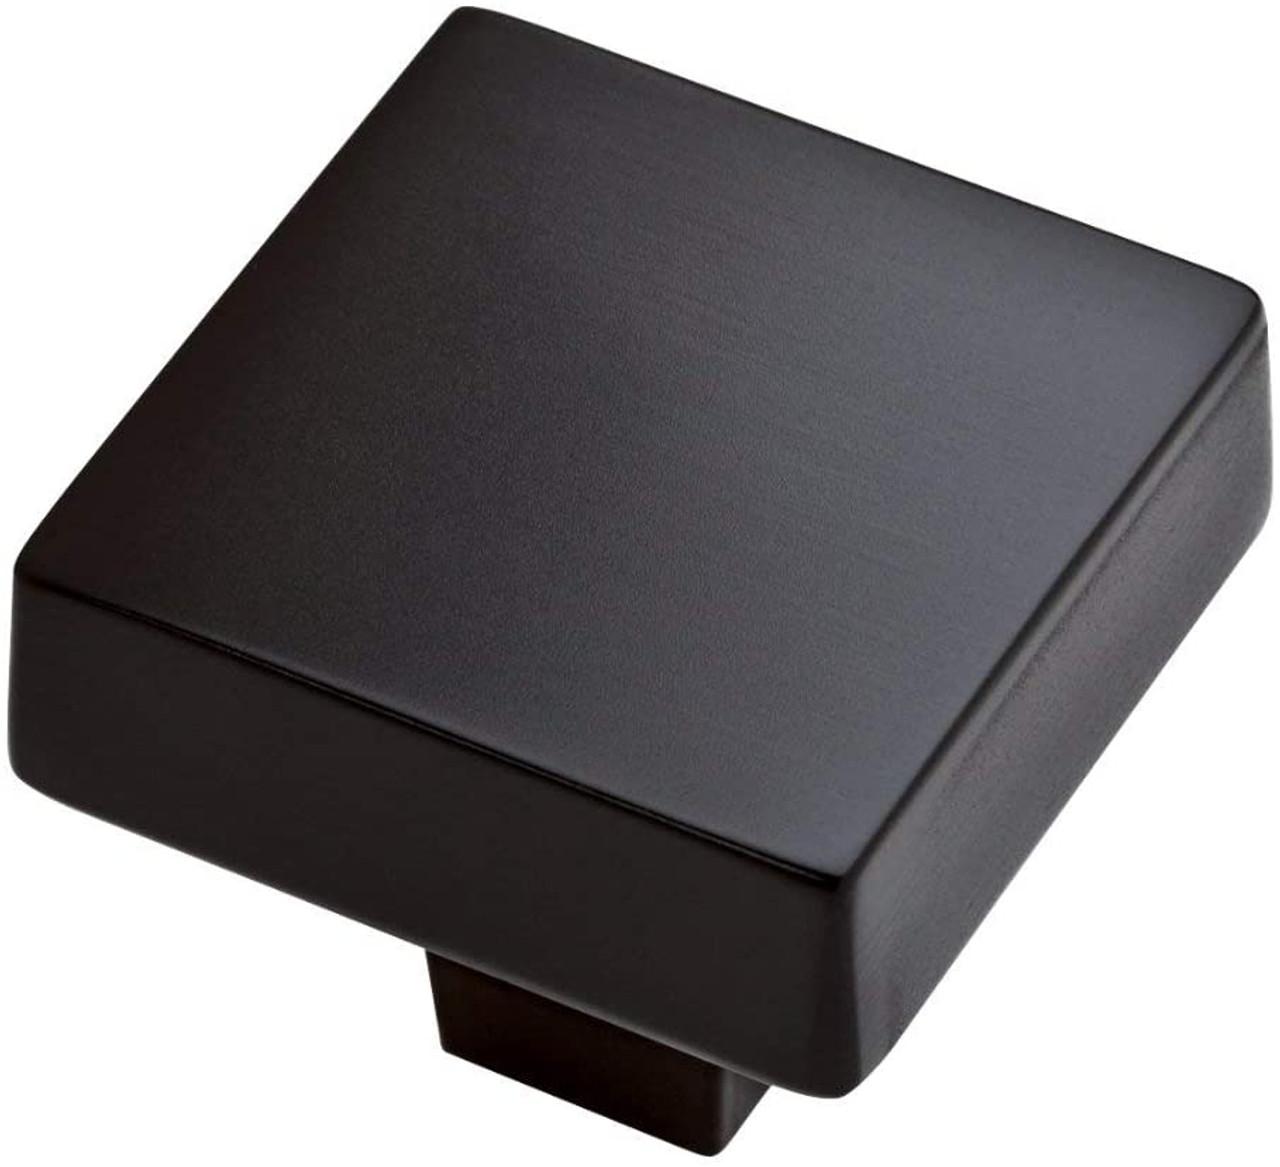 "Liberty P34941C-FB Flat Black Squared Modern 1 7/16"" Cabinet & Drawer Knob"